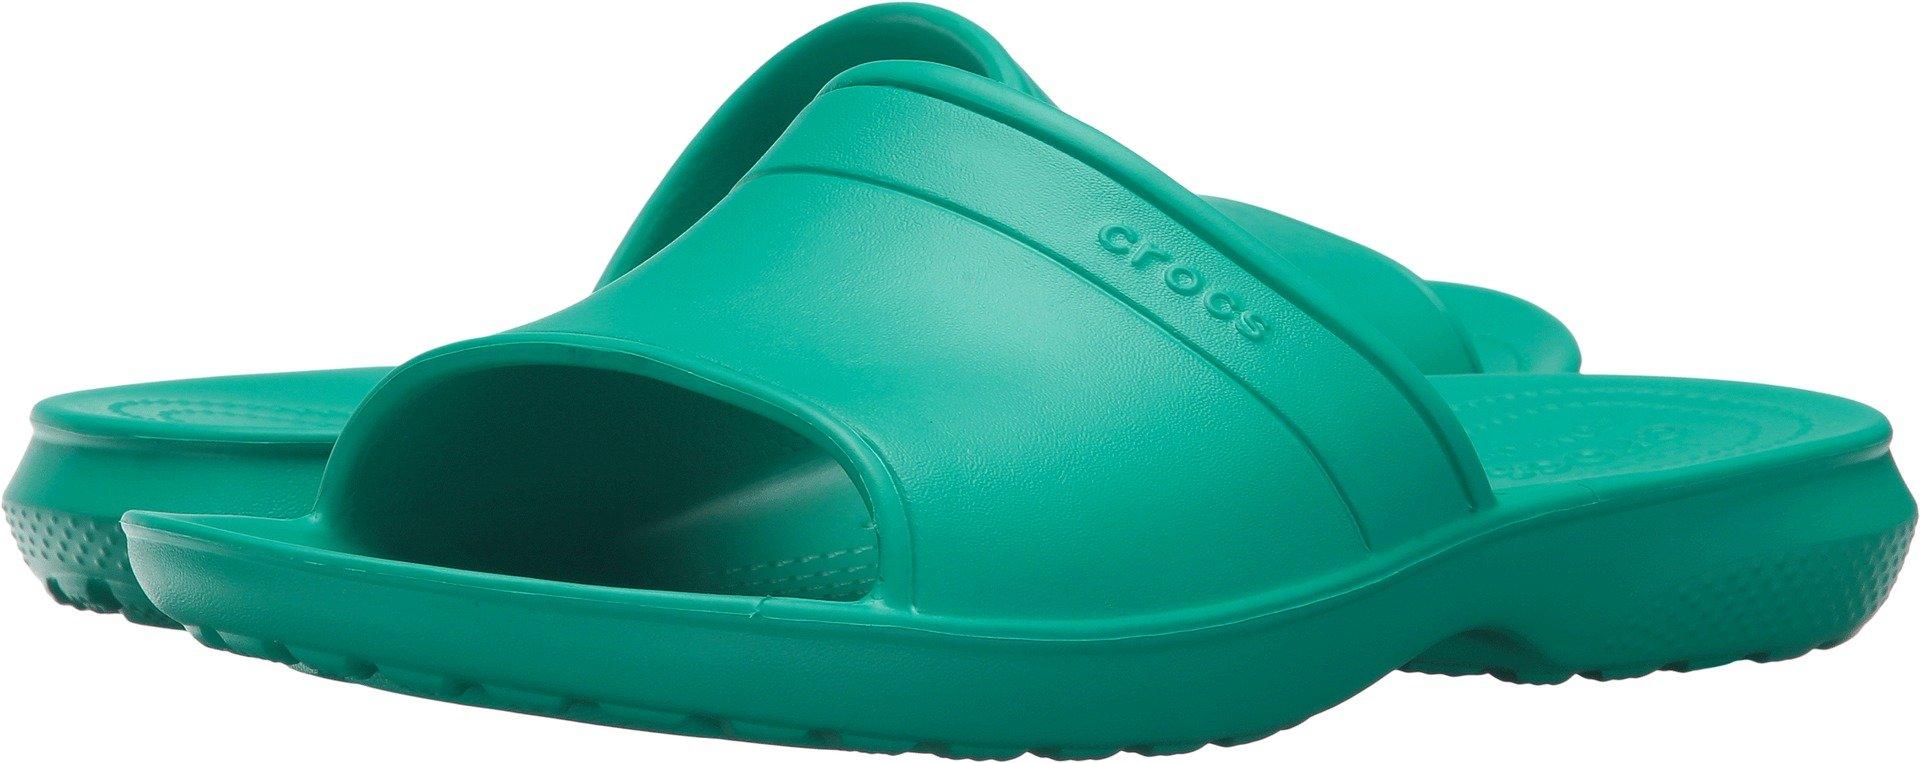 Crocs Classic Slide Sandal, Tropical Teal, 5 US Men/7 US Women M US